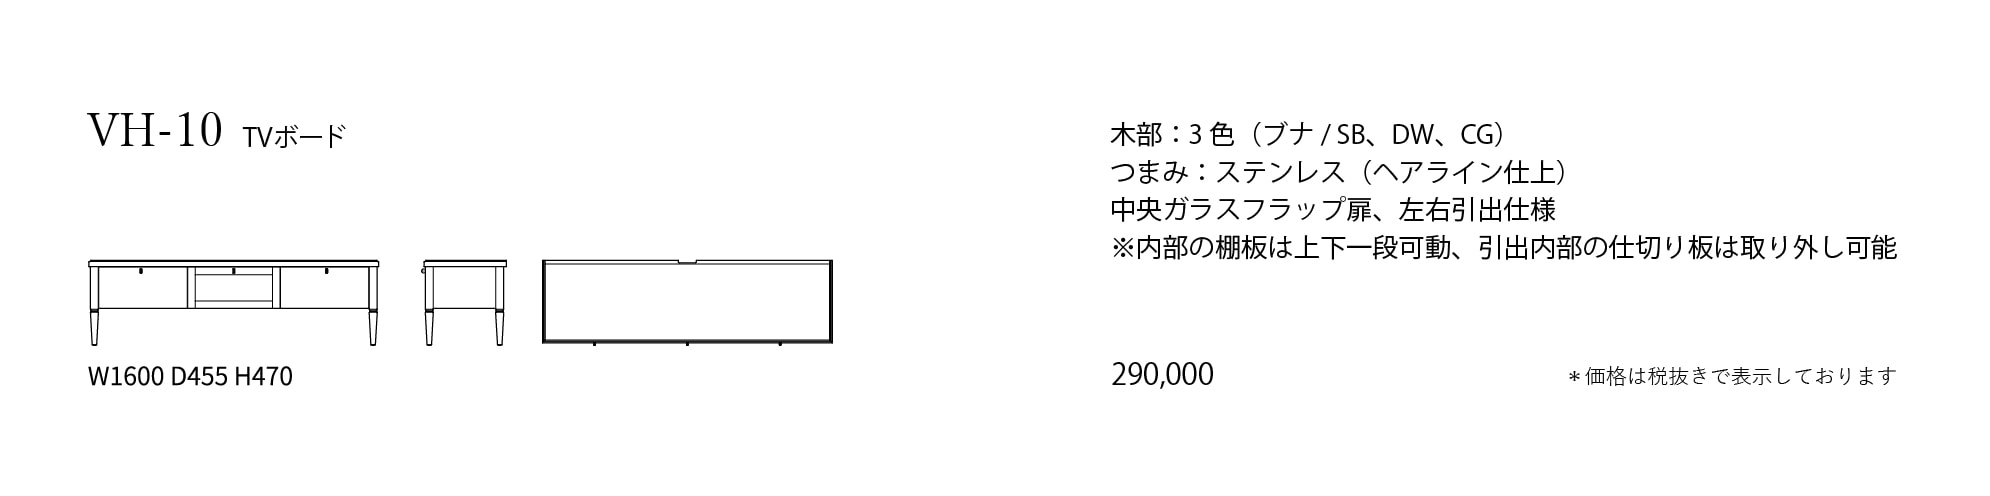 VH-10 Price List